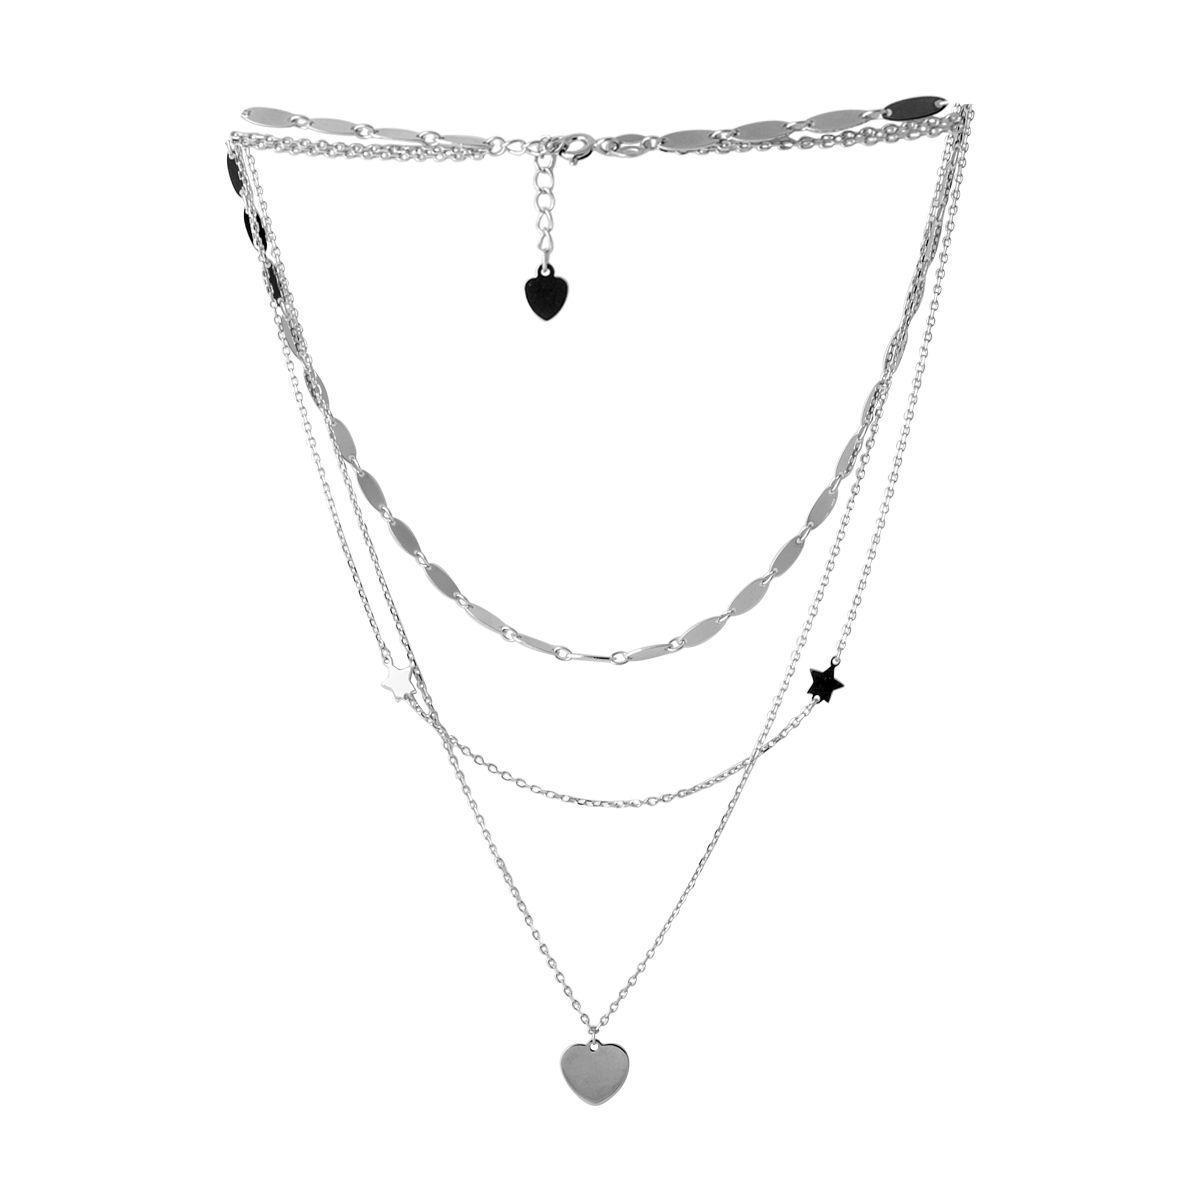 Серебряное колье pSilverAlex без камней (2052876) 500 размер